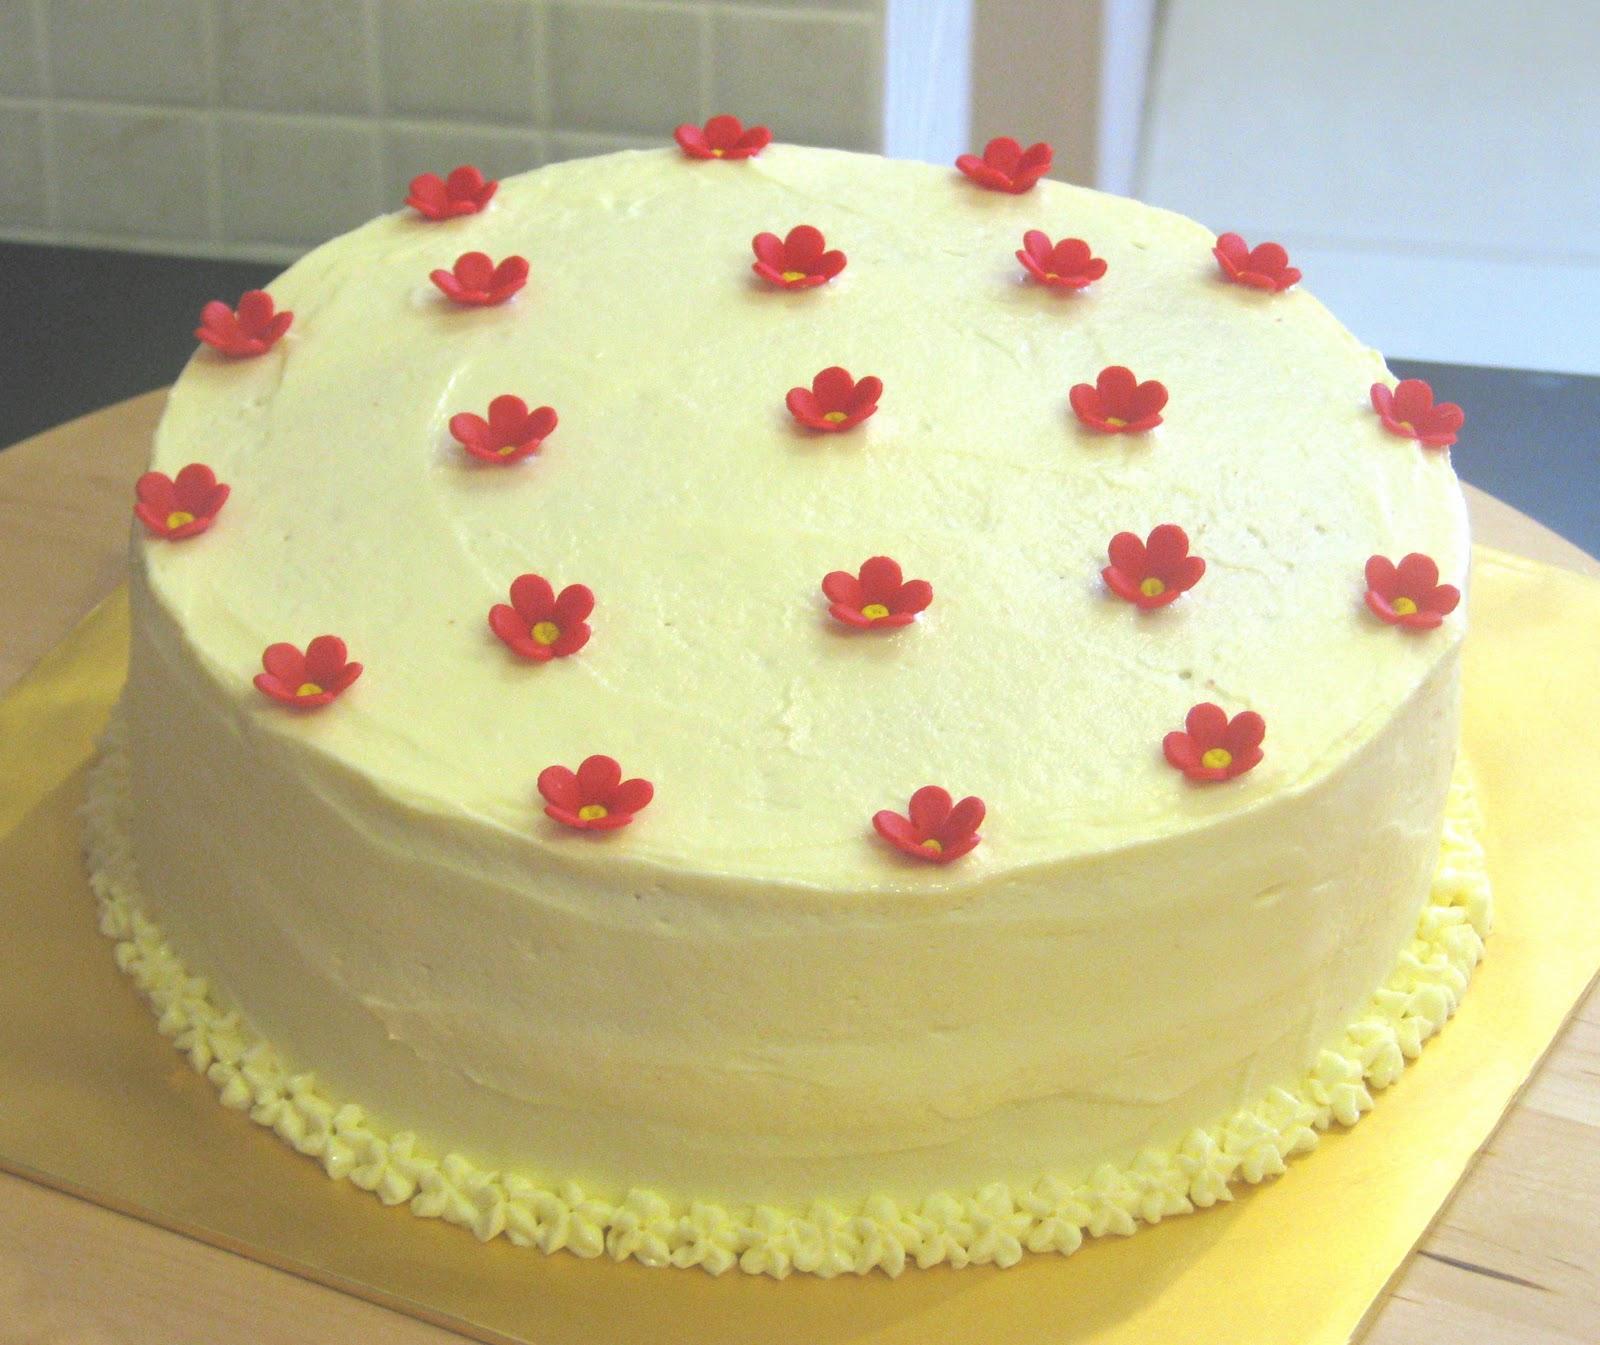 Traditional Southern Red Velvet Cake